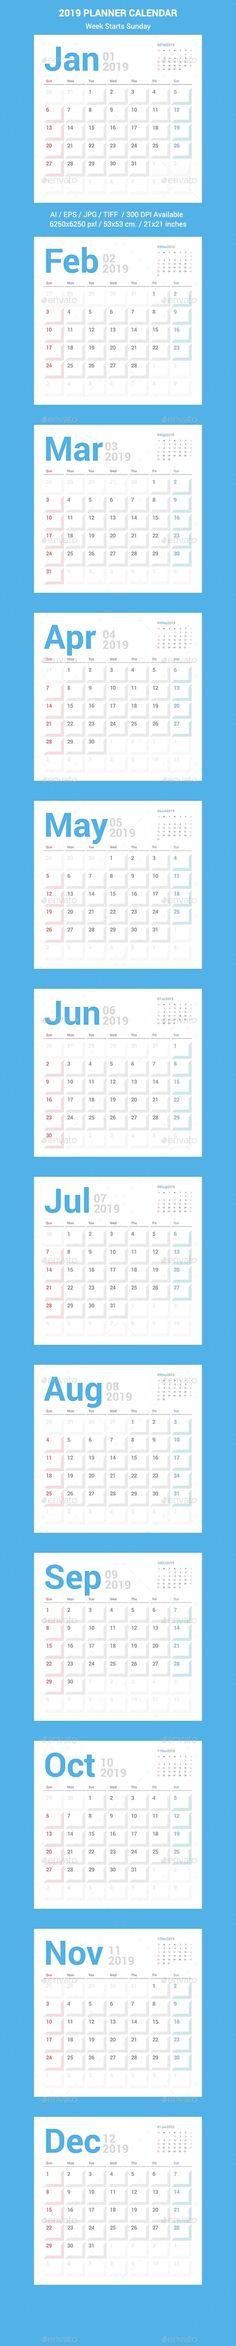 by ctrlaplus on GraphicRiver. Calendar 2019 Planner, Office Calendar, Desk Calendars, Stationery Templates, Stationery Design, Print Templates, Calendar Templates, Print Design, Graphic Design